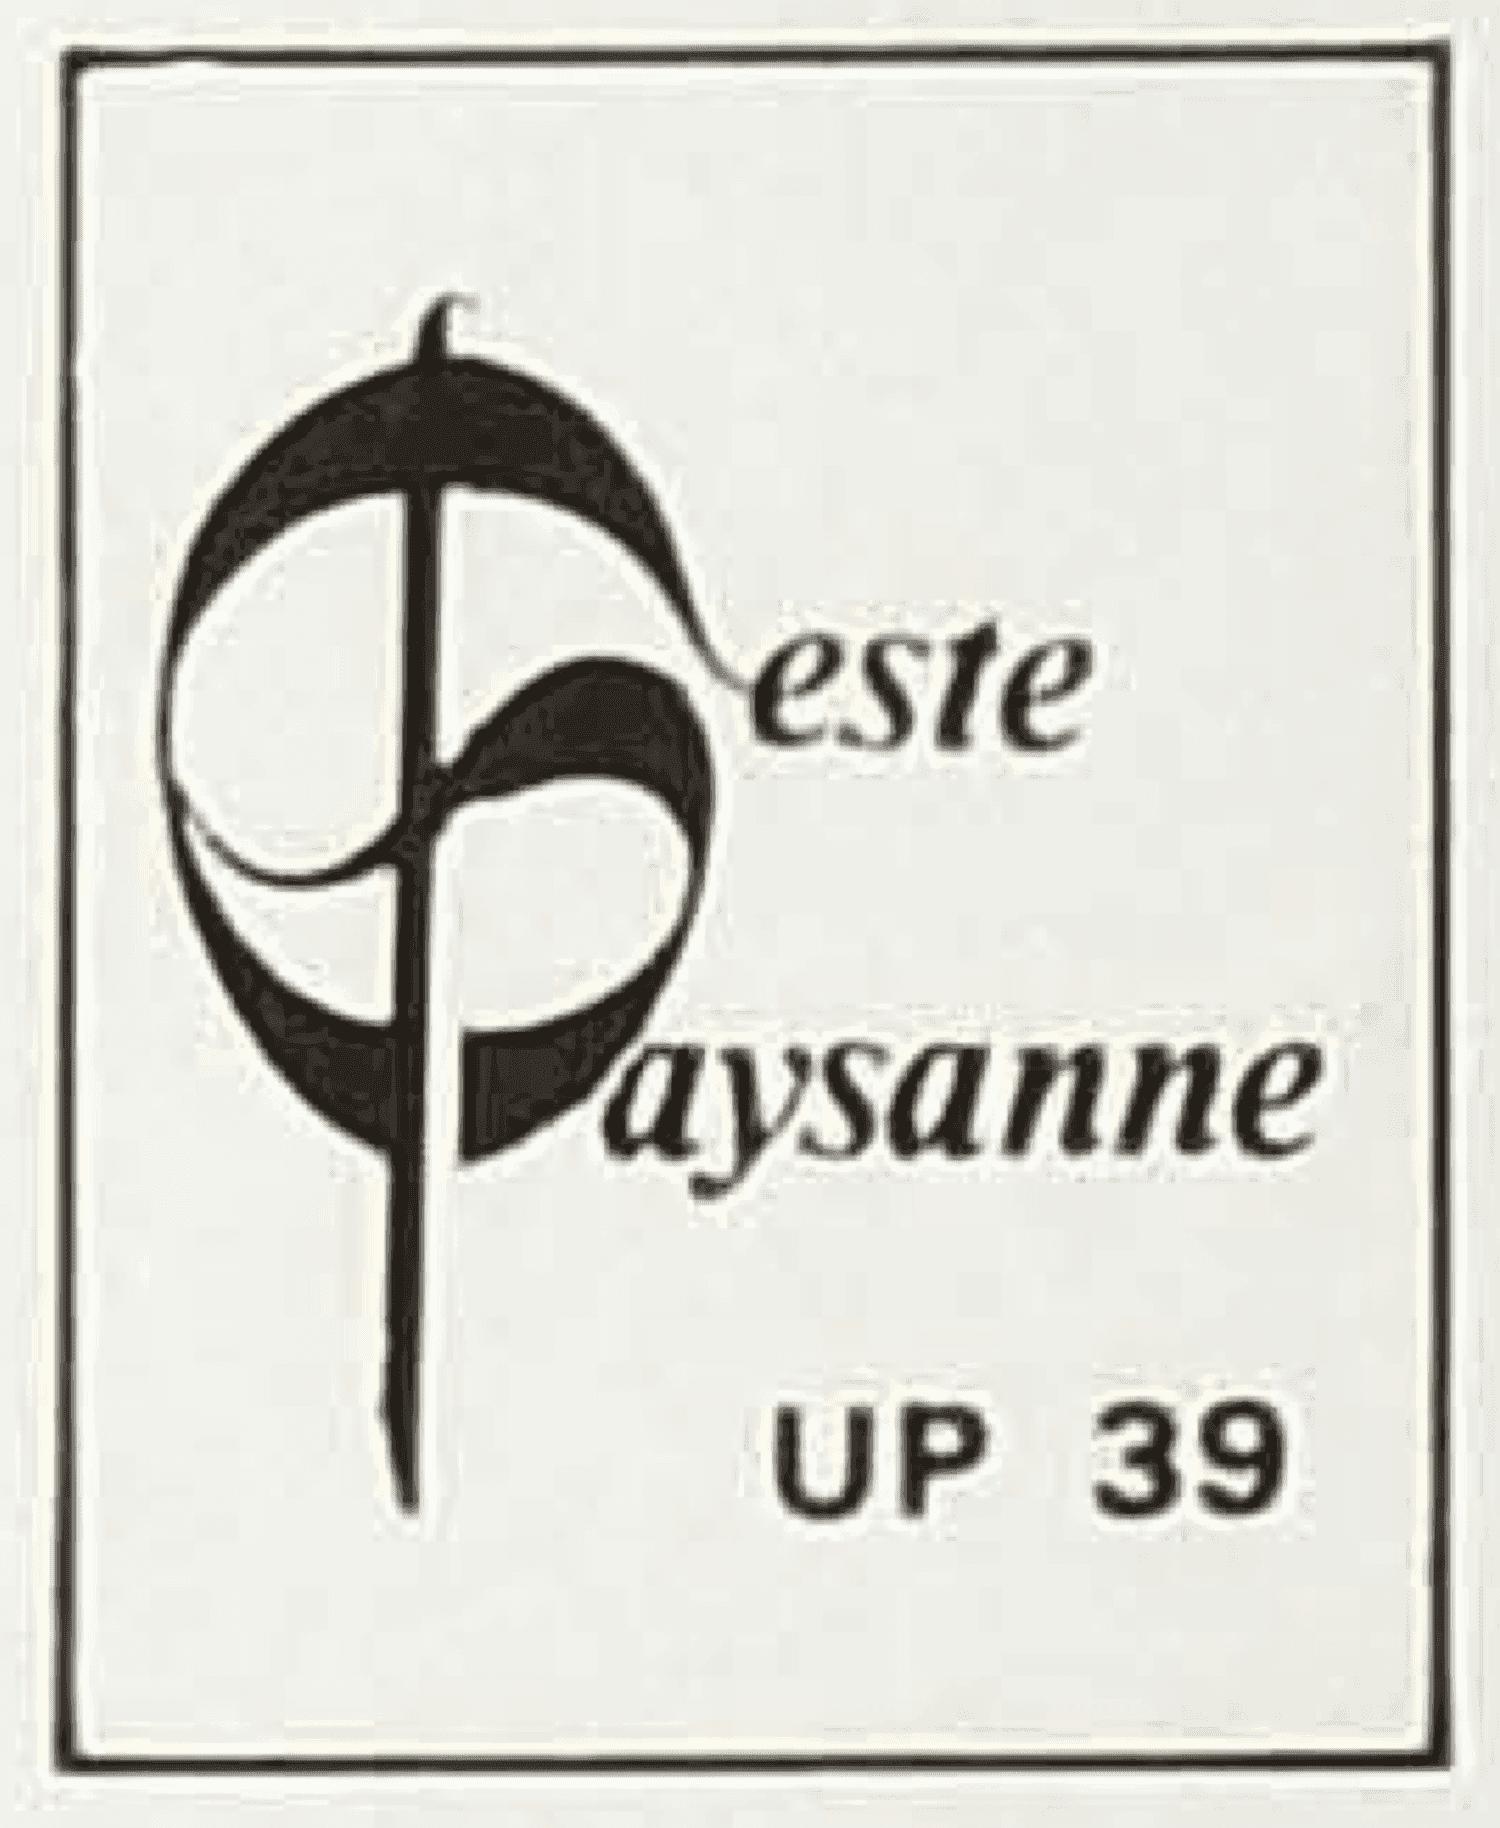 Logo – Geste Paysanne UP 39